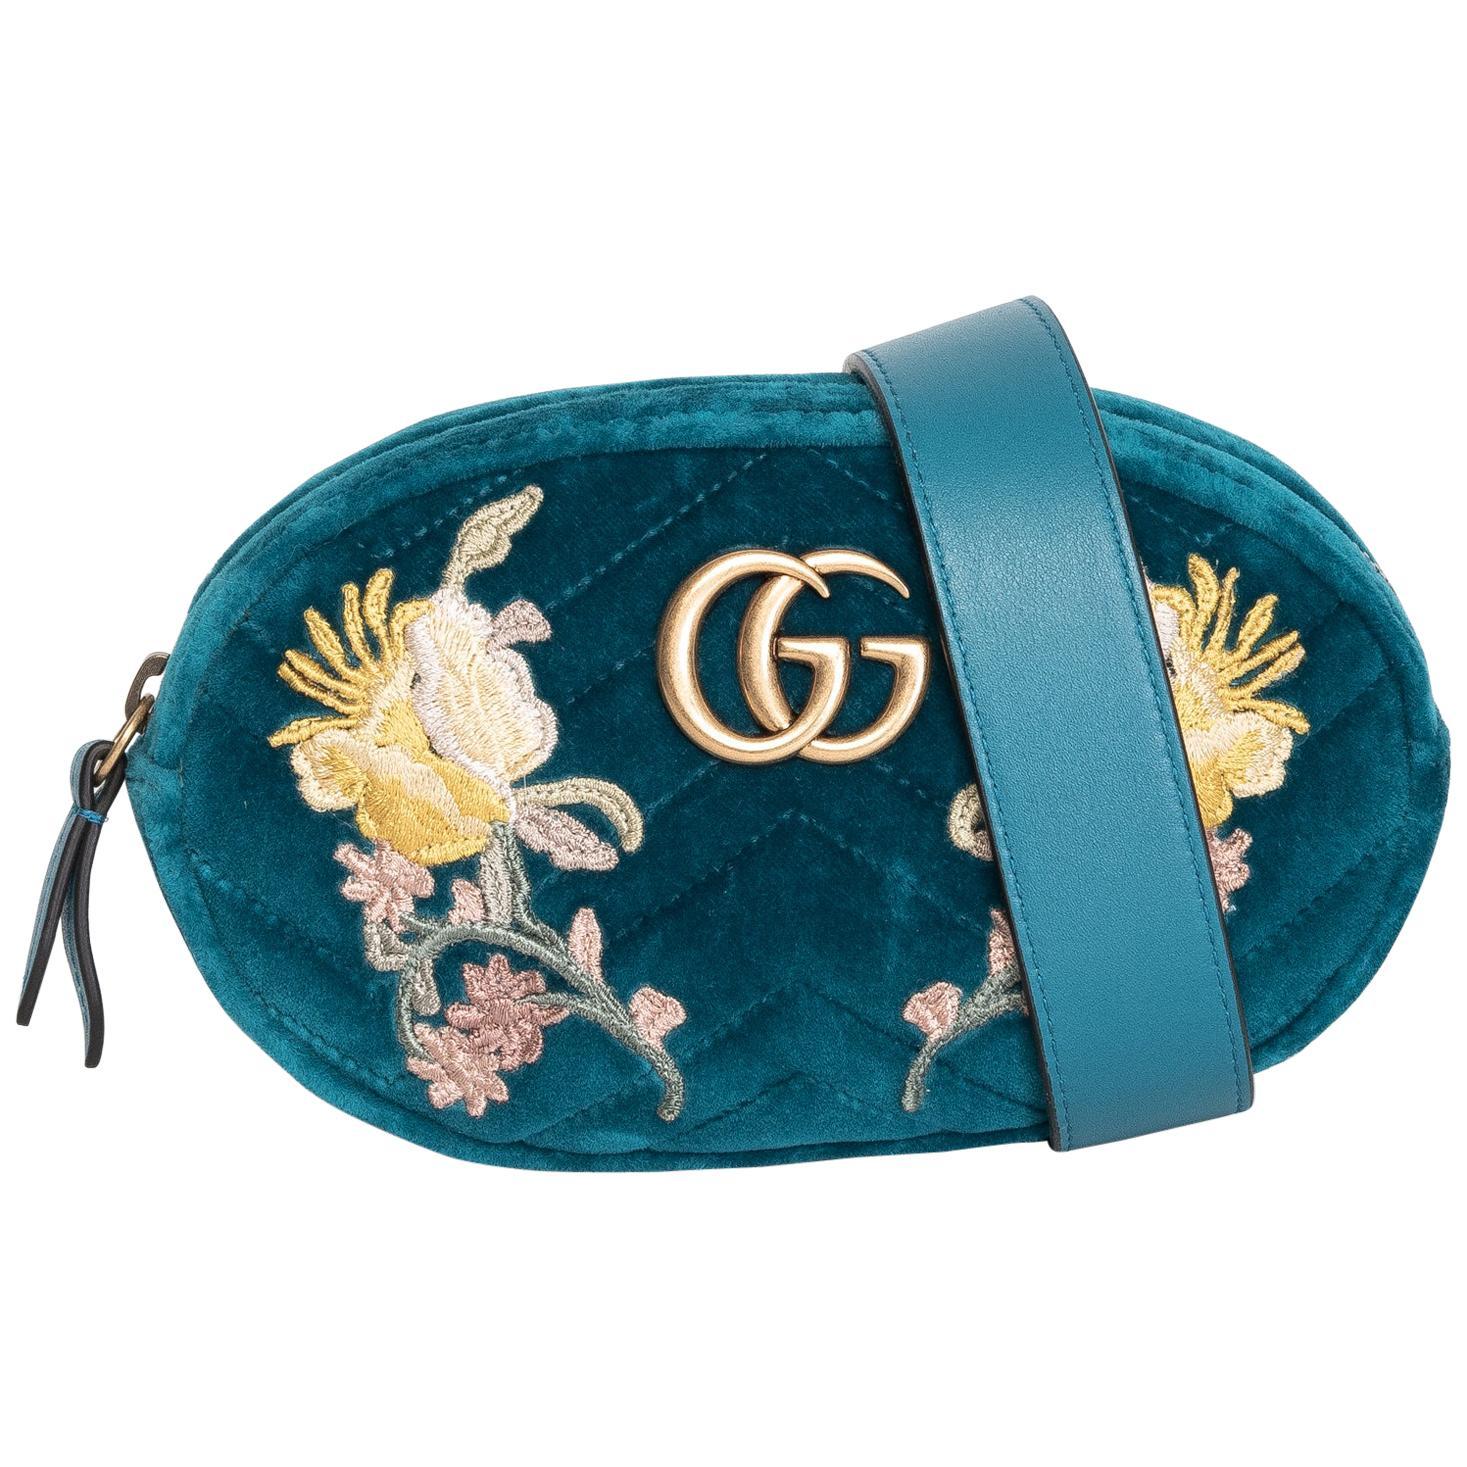 Gucci Water Green Velvet Embroidered GG Marmont Belt Bag